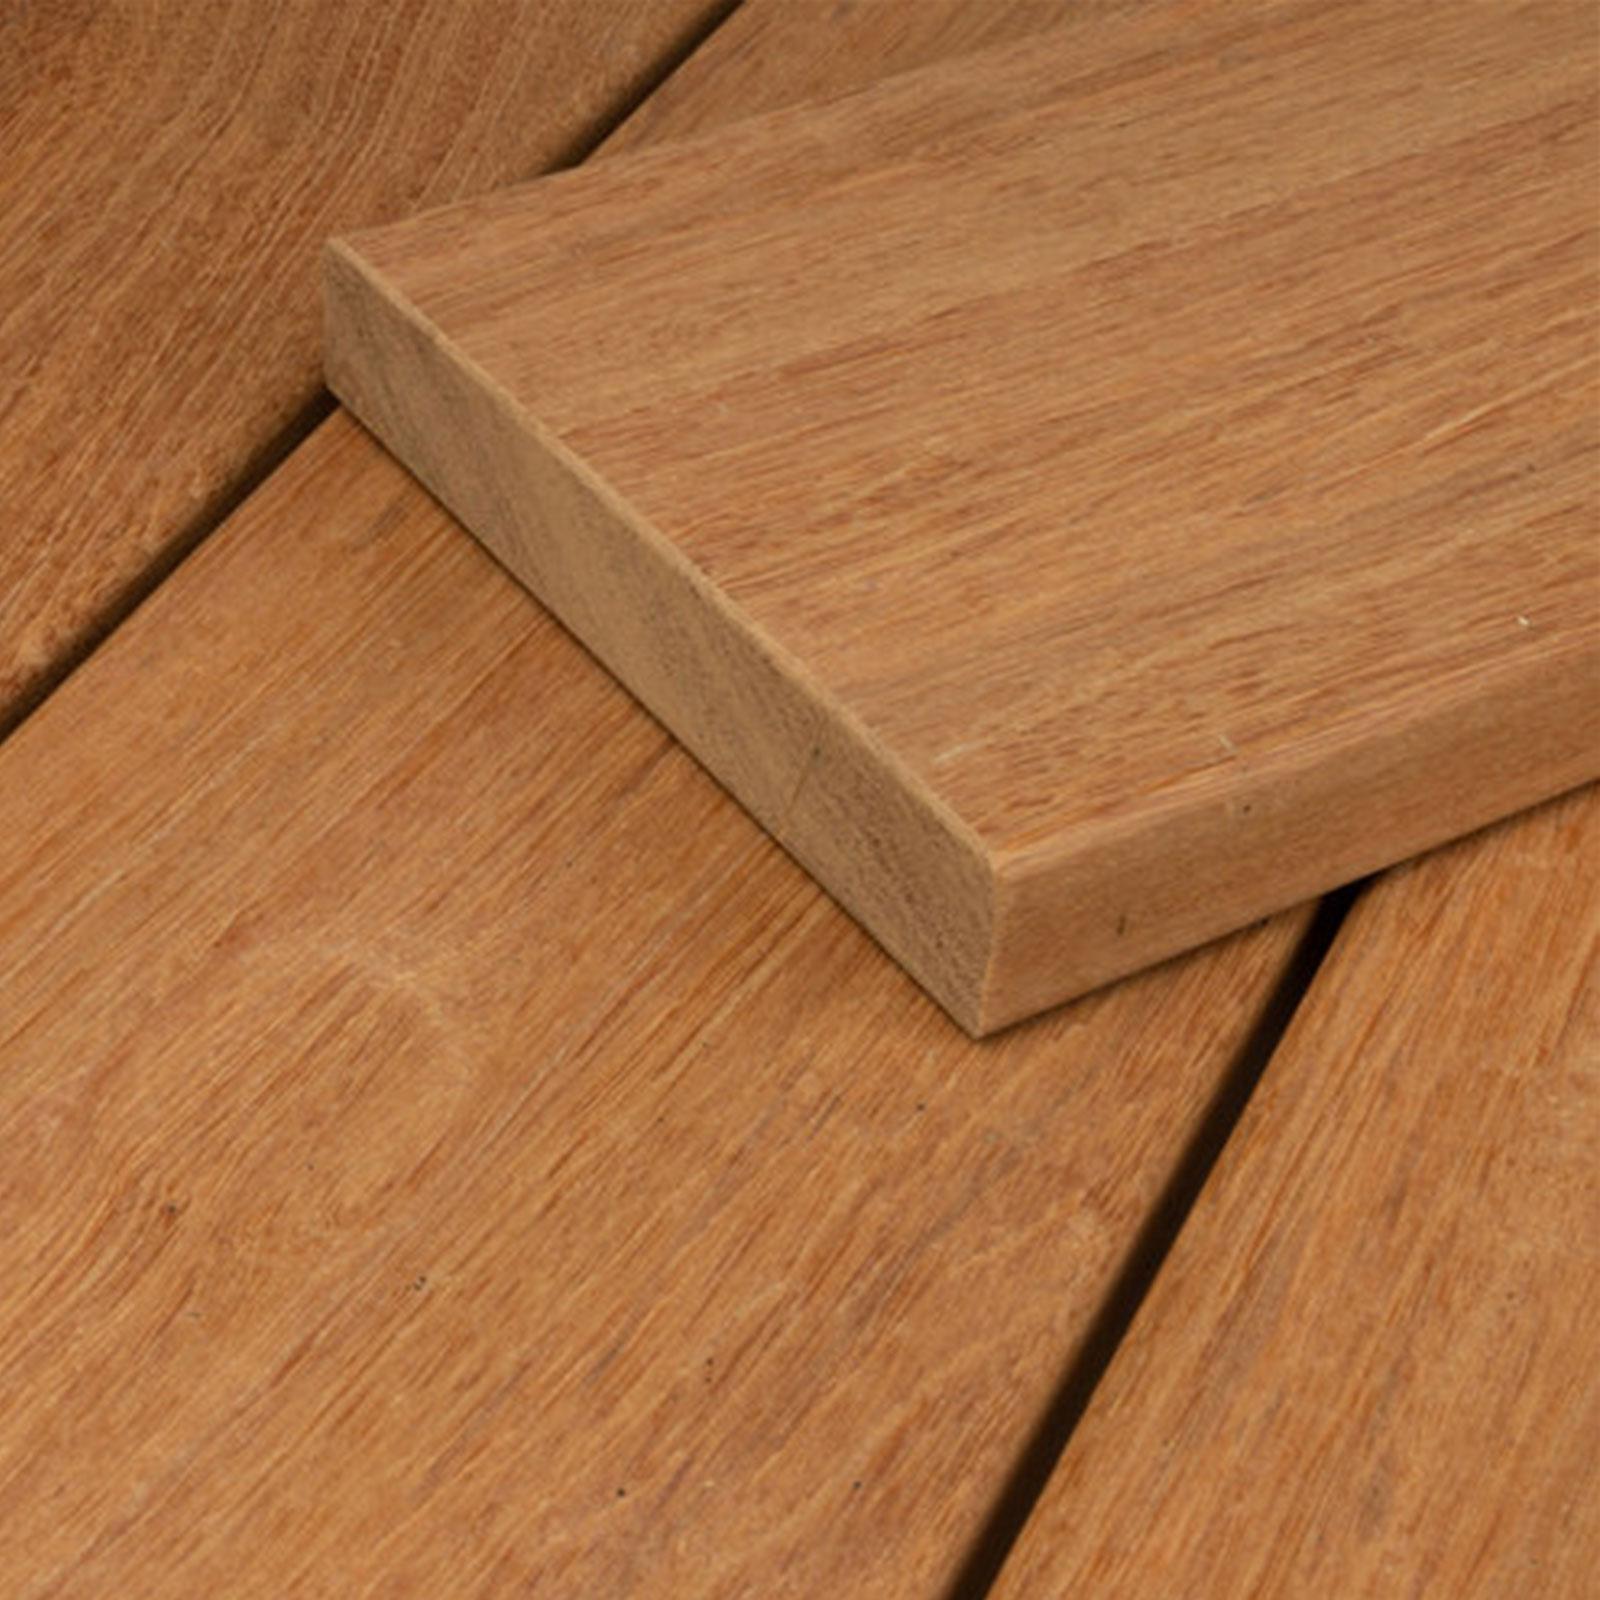 HORI Bangkirai Terrassendielen Komplettset Premium Holz Terrasse ...